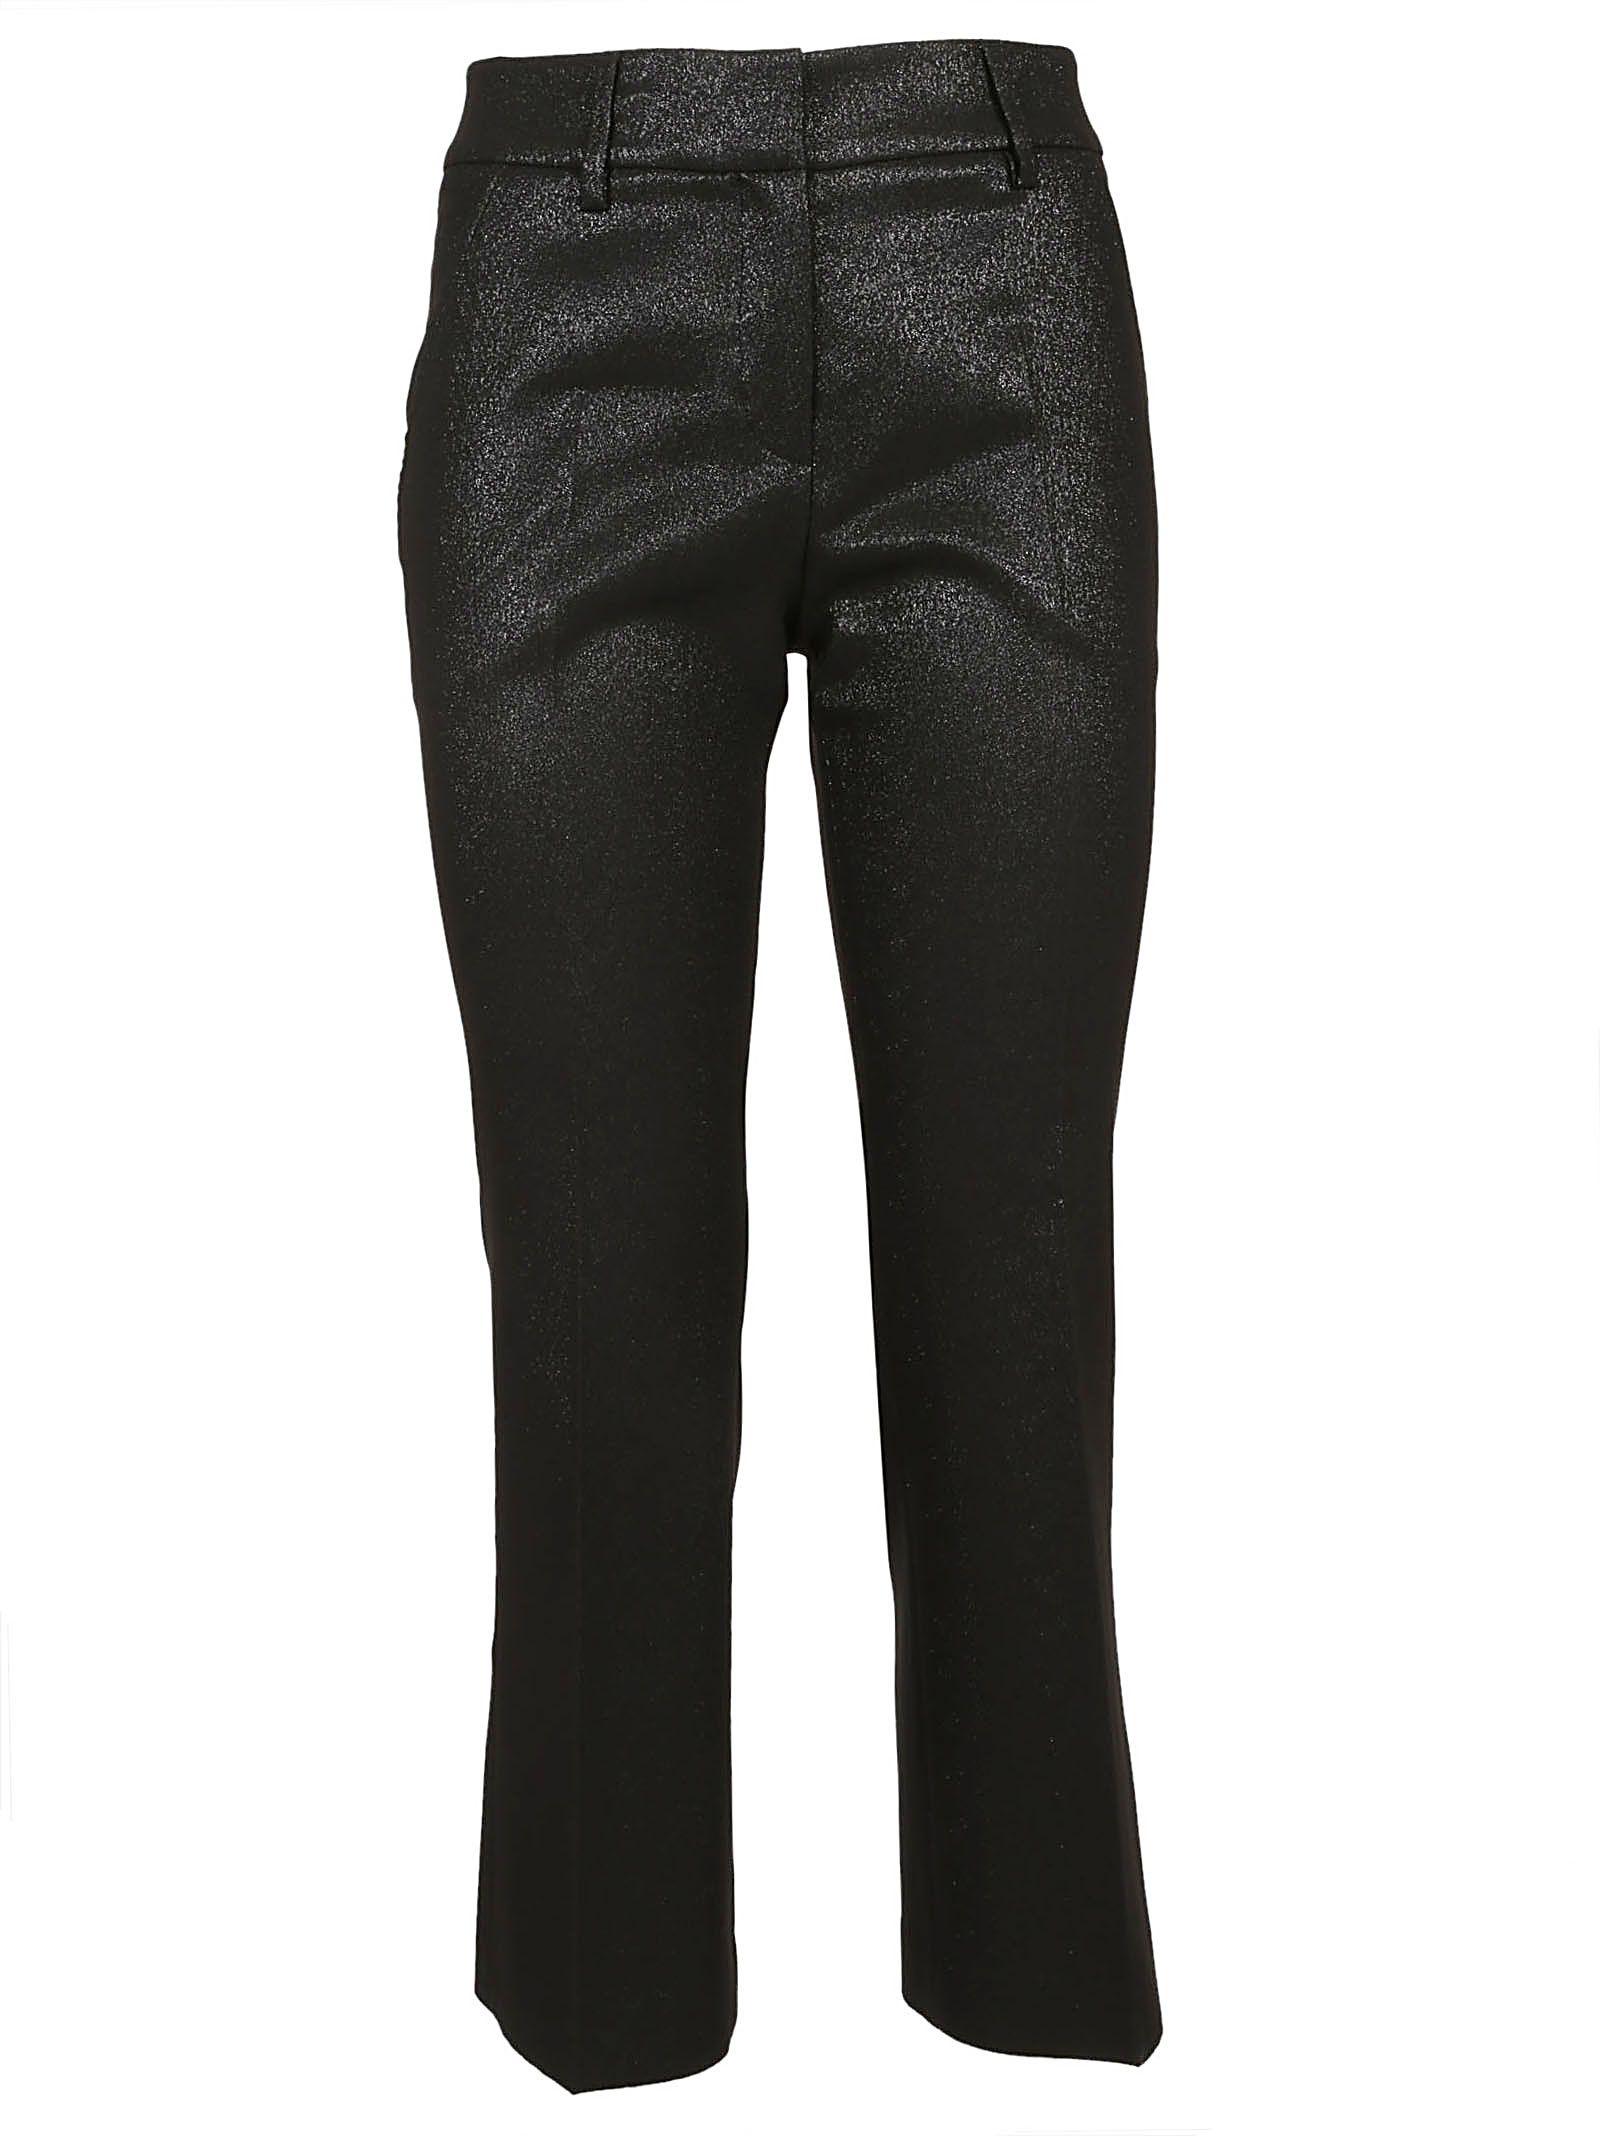 TRUE ROYAL Glittered Trousers in Nero